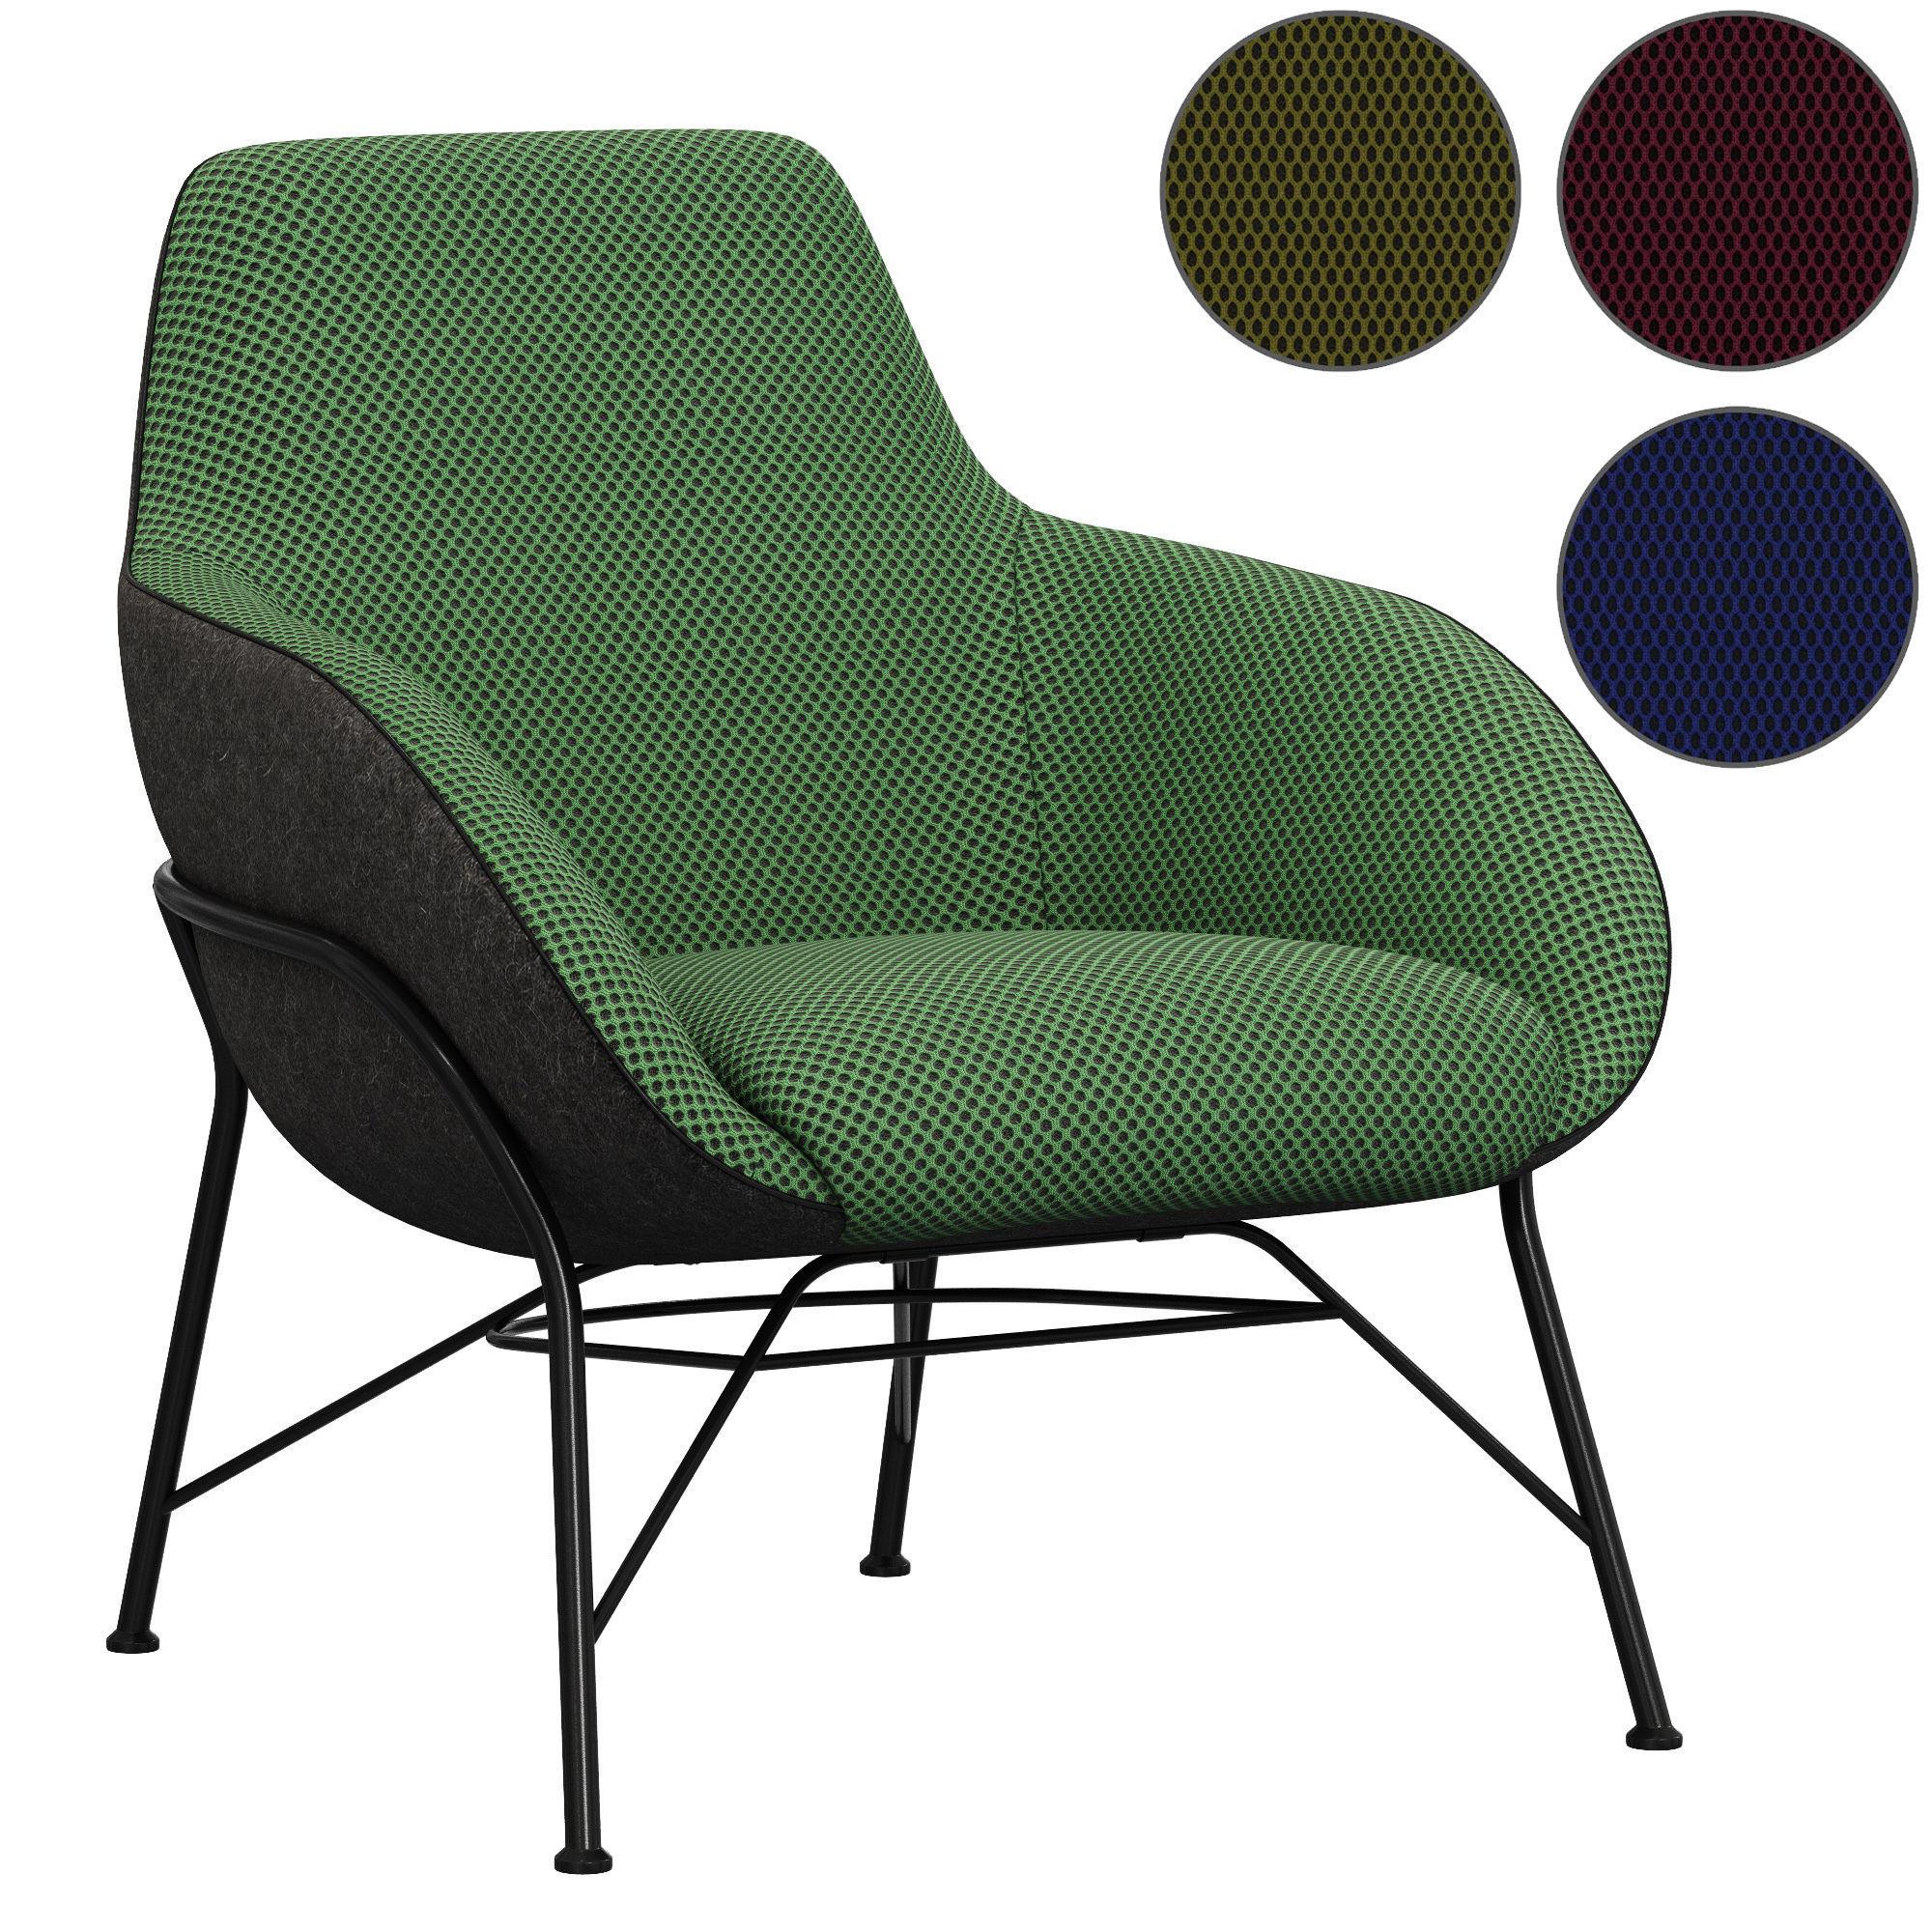 Roche Bobois Tilt armchair